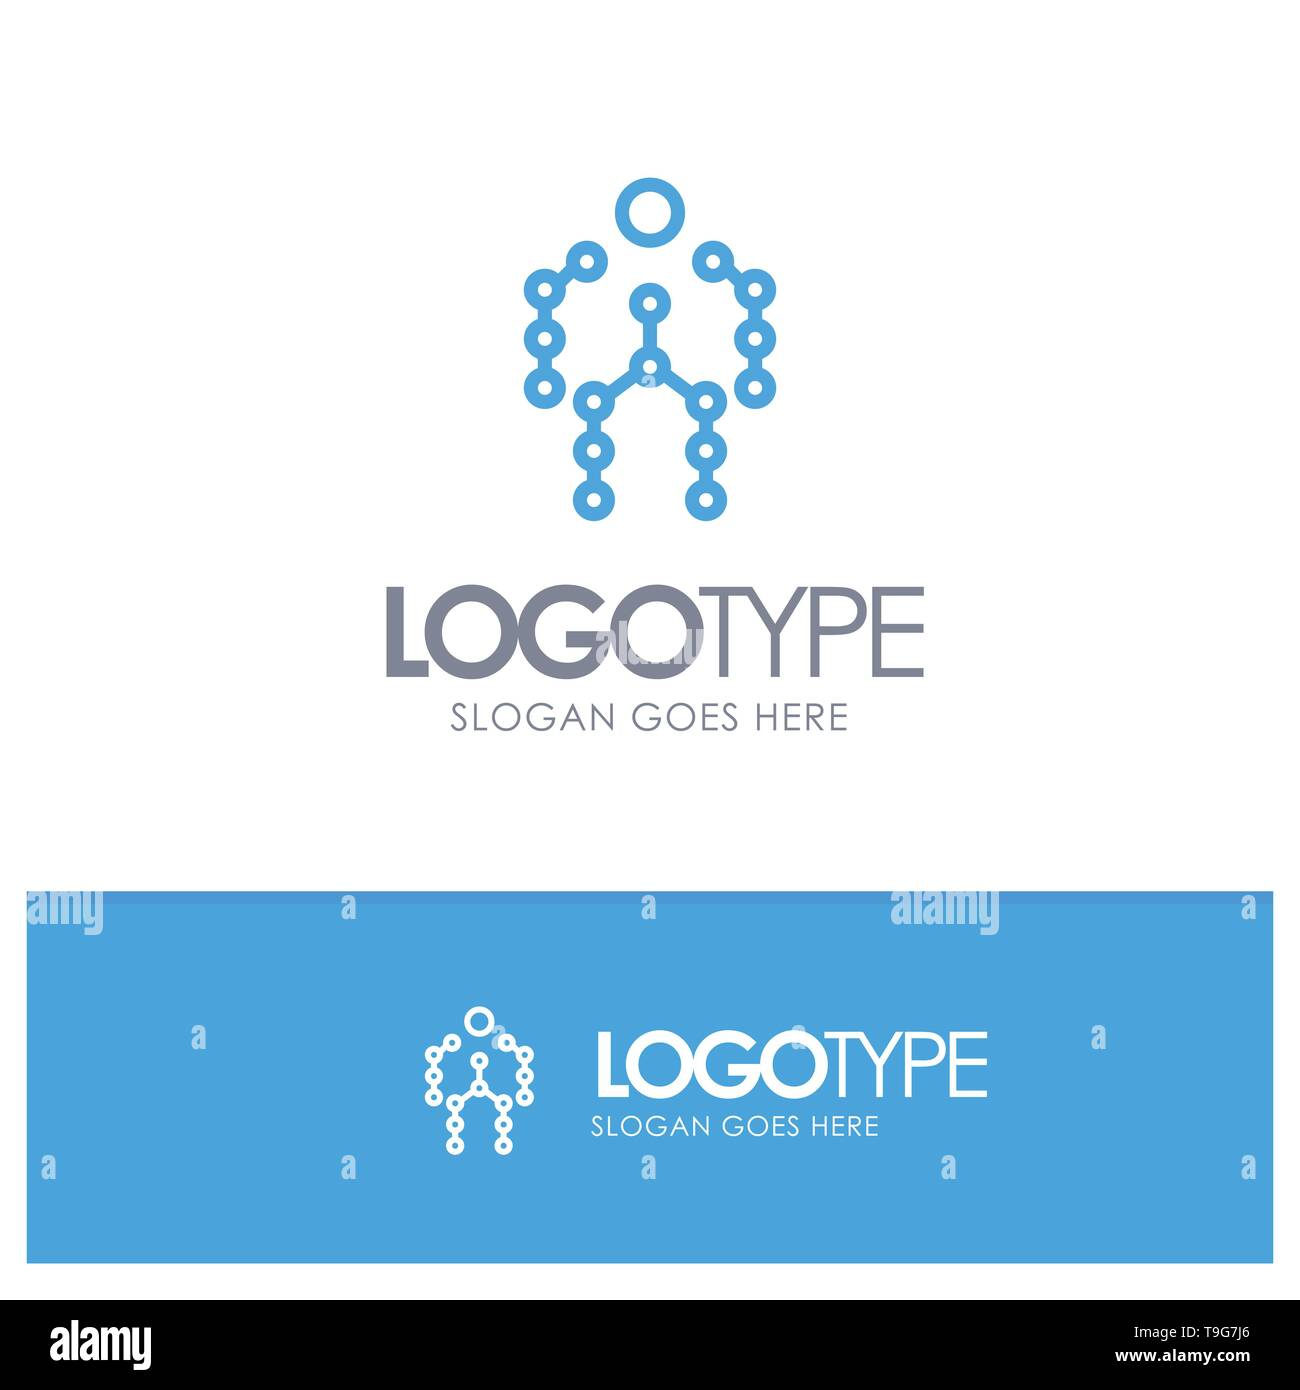 Action, Bones, Capture, Human, Motion Blue outLine Logo with place for tagline - Stock Image